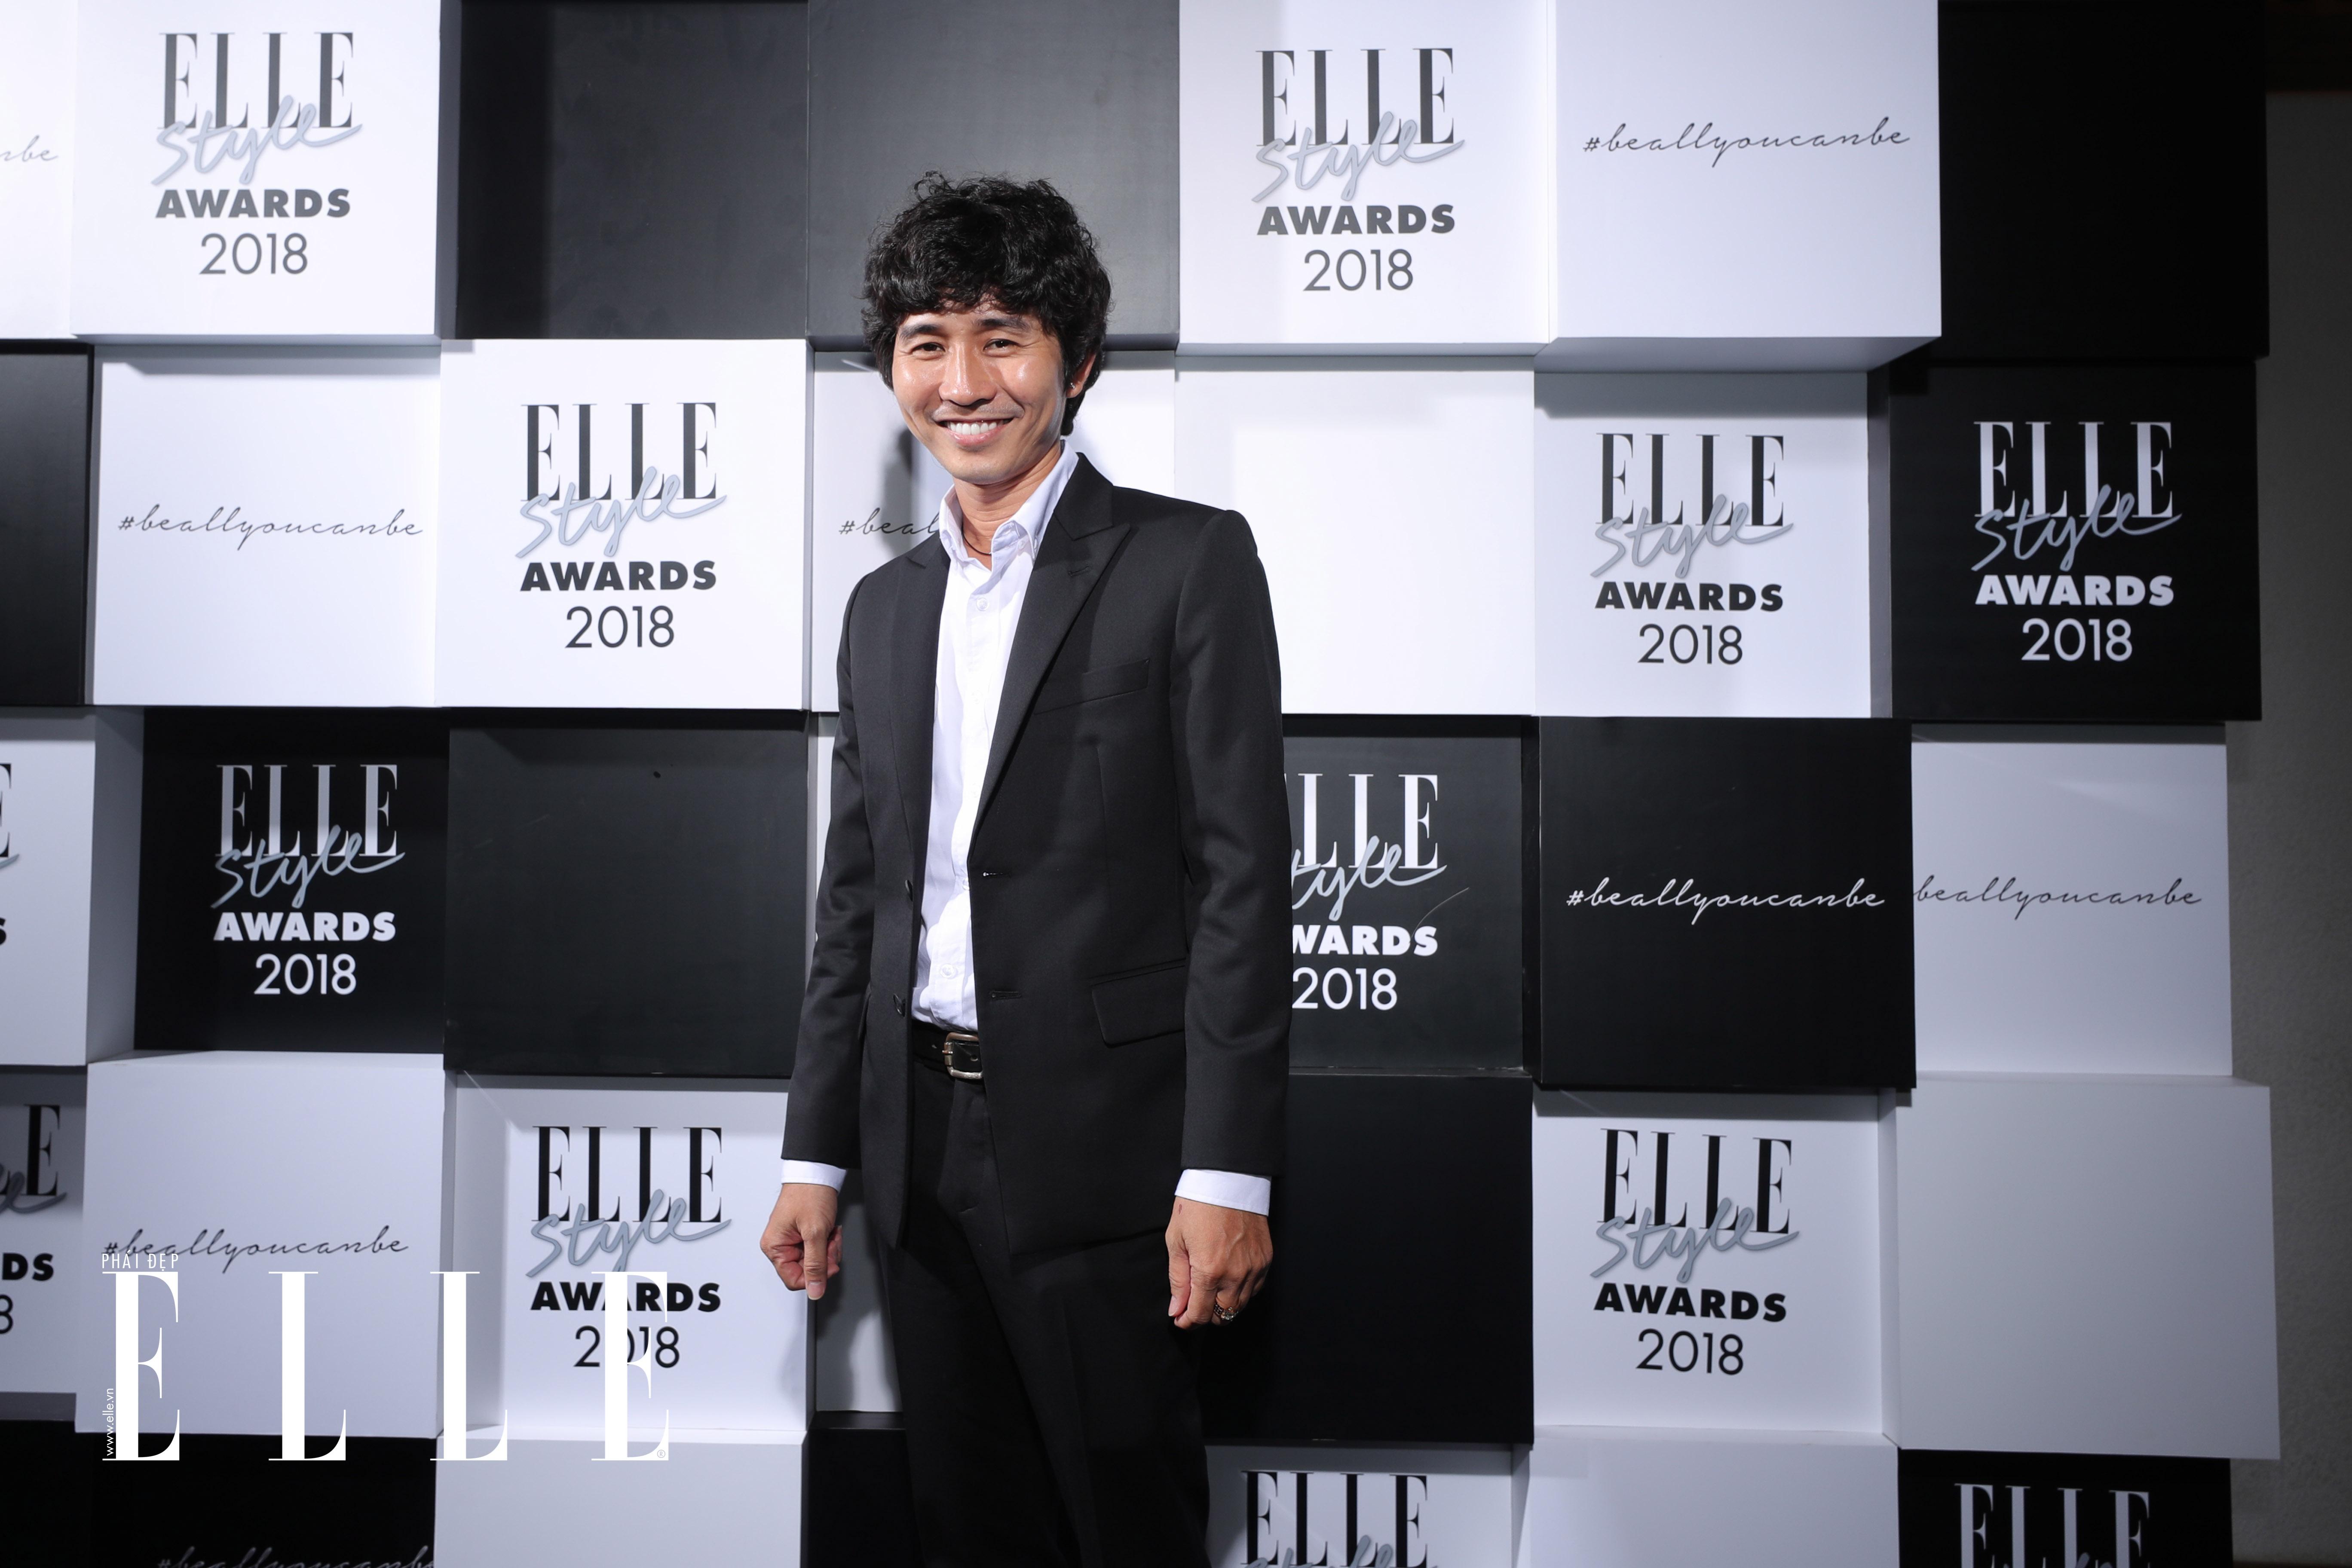 ELLE Style awards TungChau - elle man